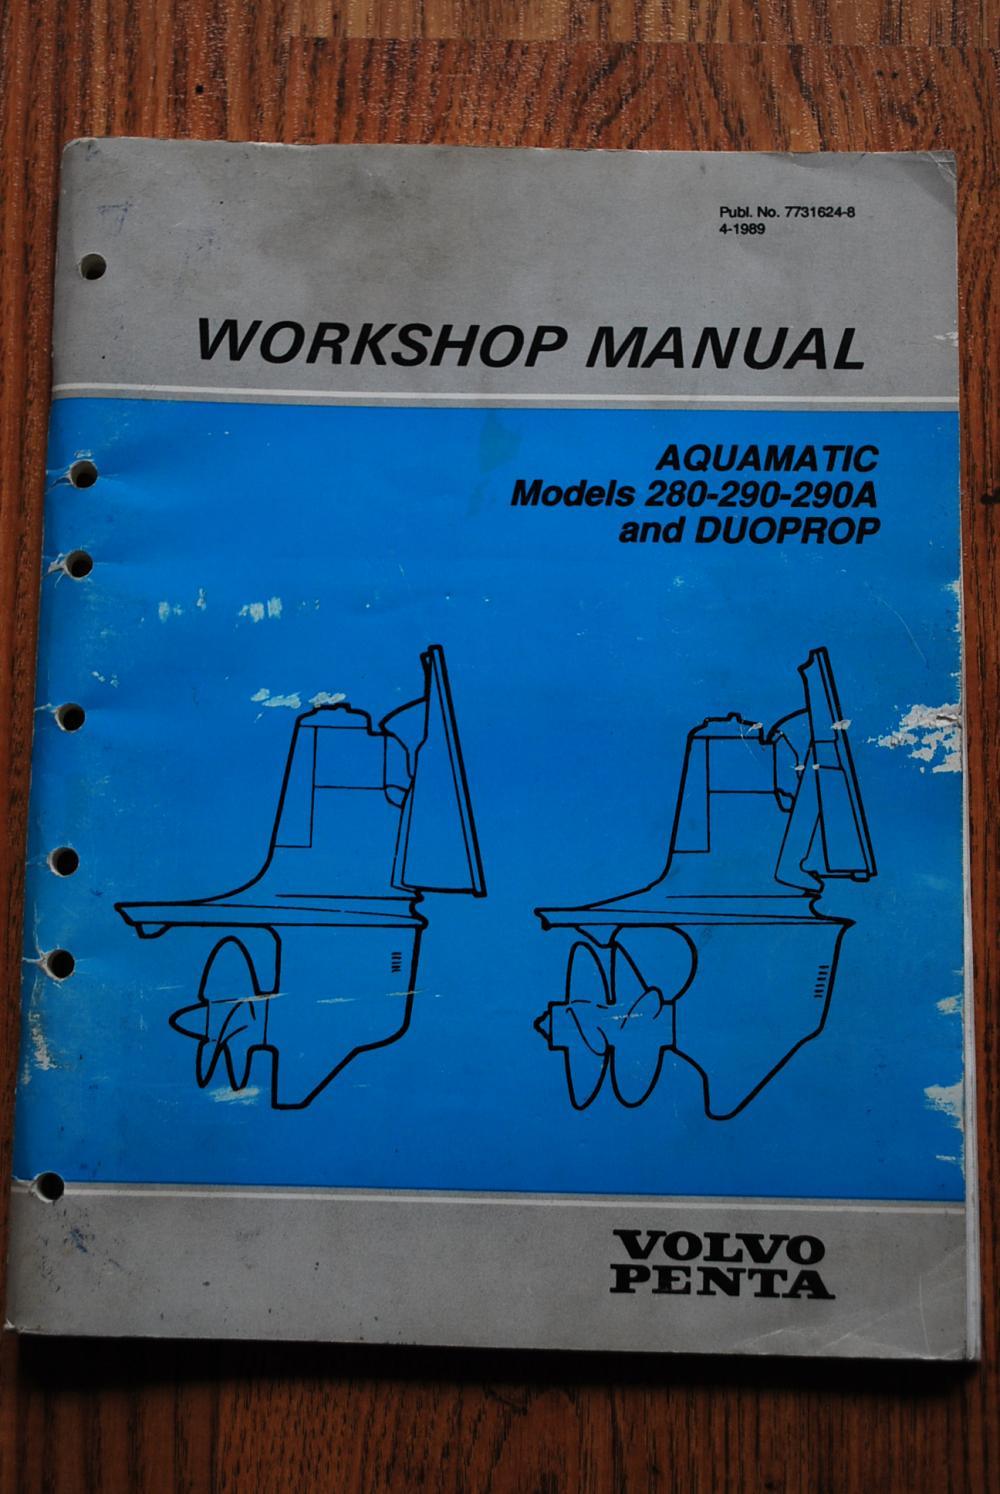 volvo penta workshop manual for duoprop 290 290a 280 outdrives rh stripersonline com volvo penta 280 outdrive workshop manual volvo penta 280 dp manual